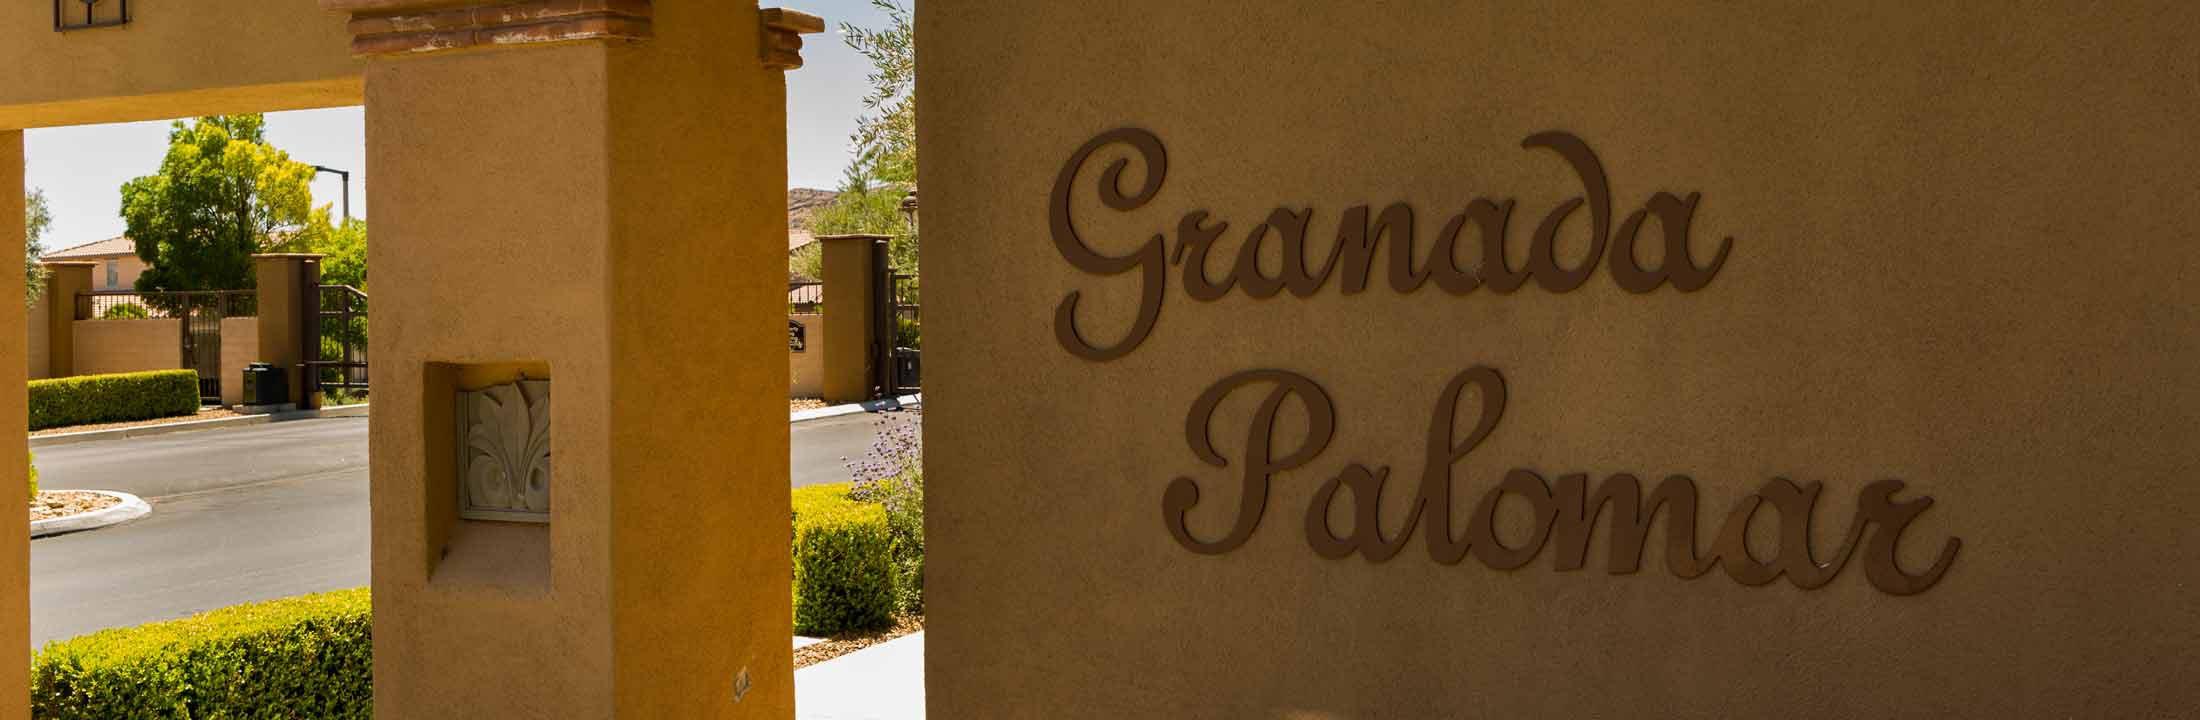 granda-palomar-homes-for-sale-las-vegas